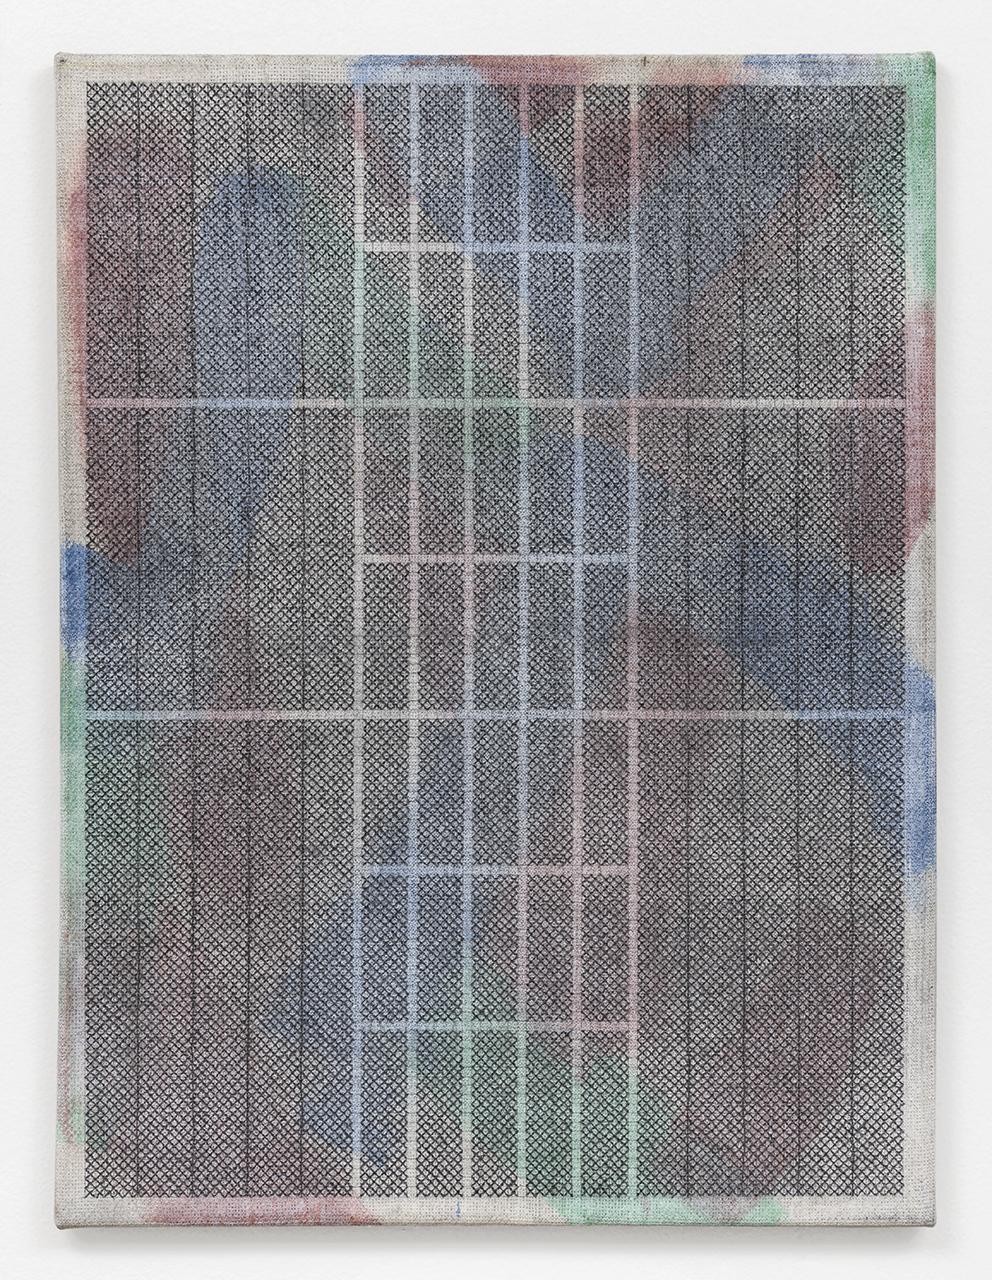 Six String Chakra, 2016